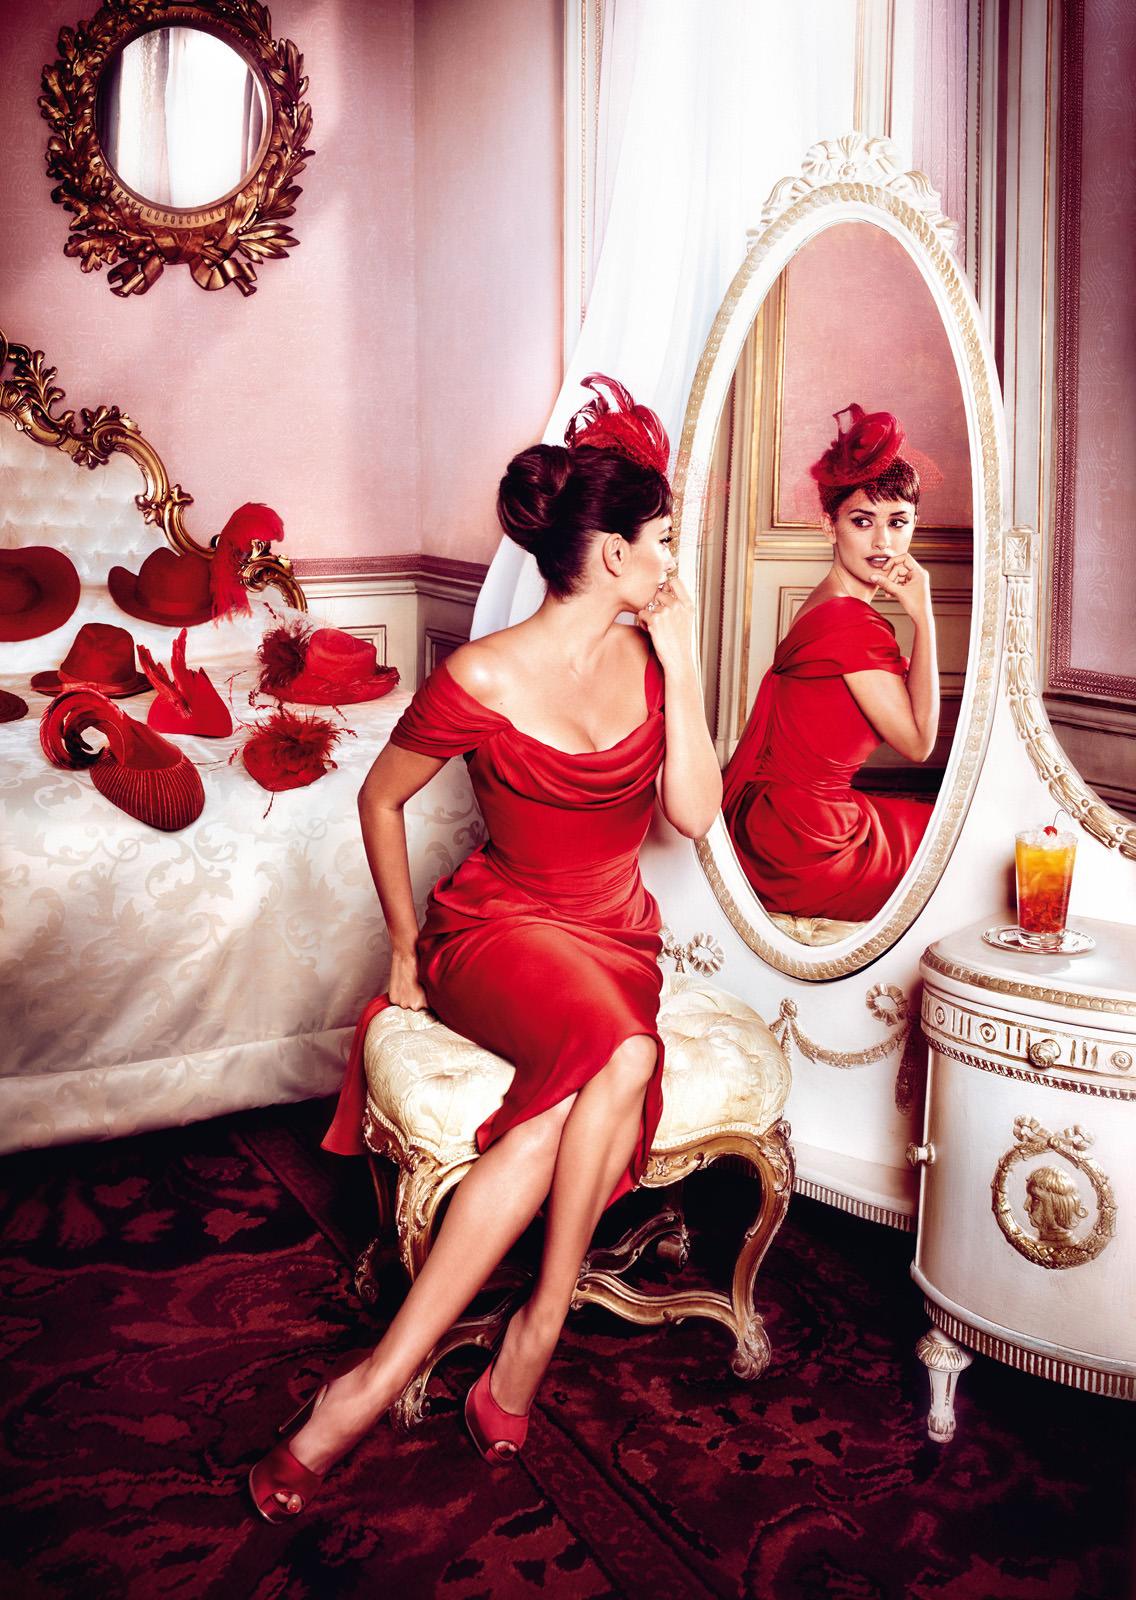 Penelope Cruz Photo Gallery